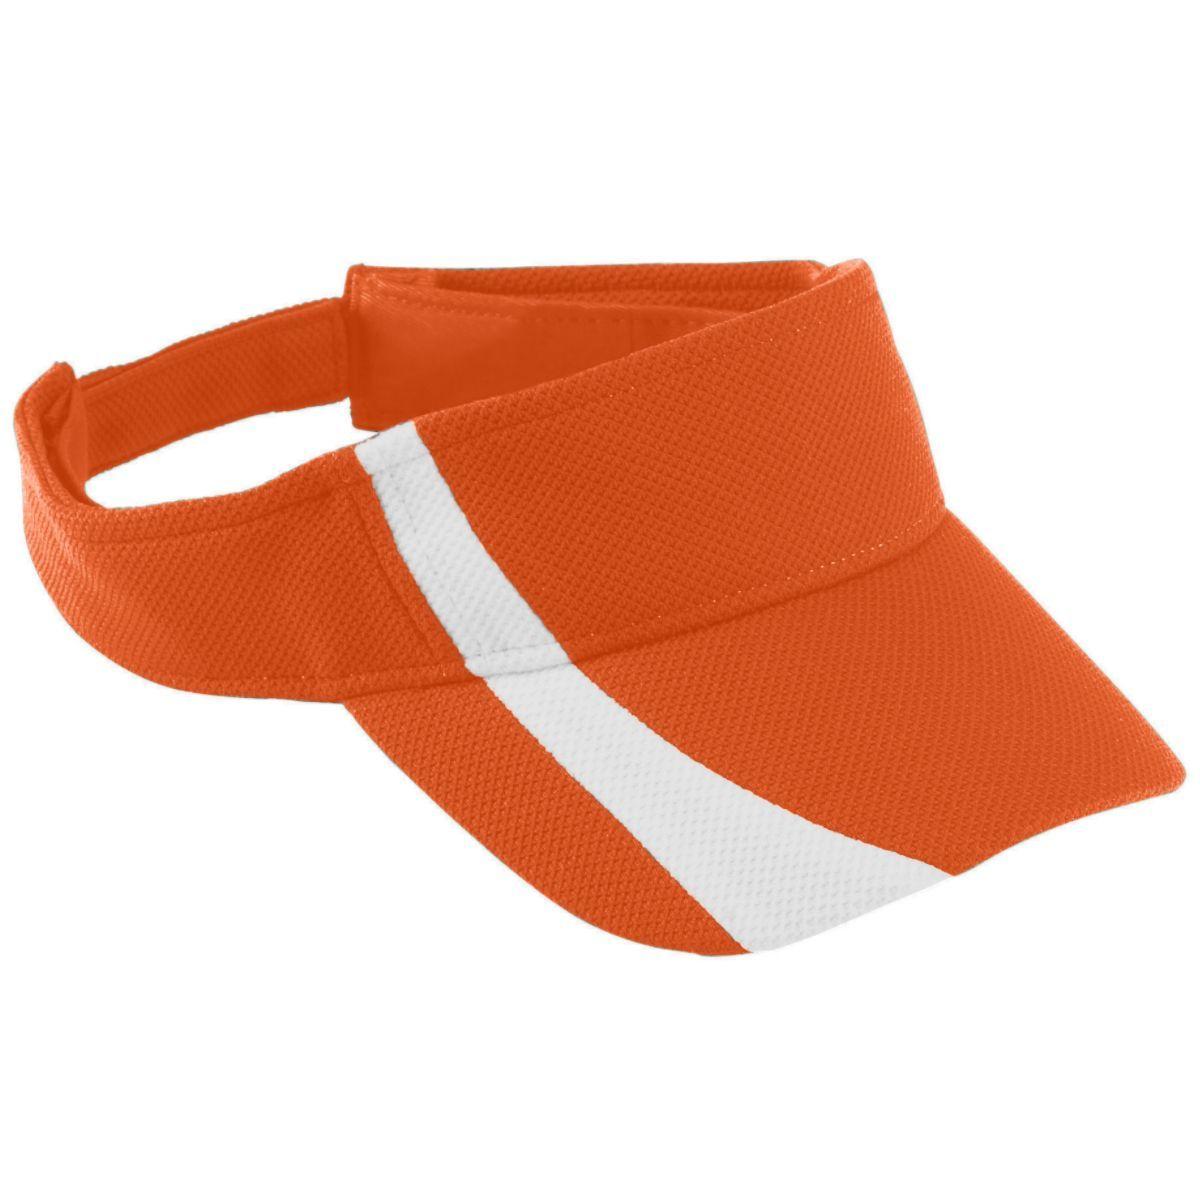 Adjustable Wicking Mesh Two-Color Visor - ORANGE/WHITE